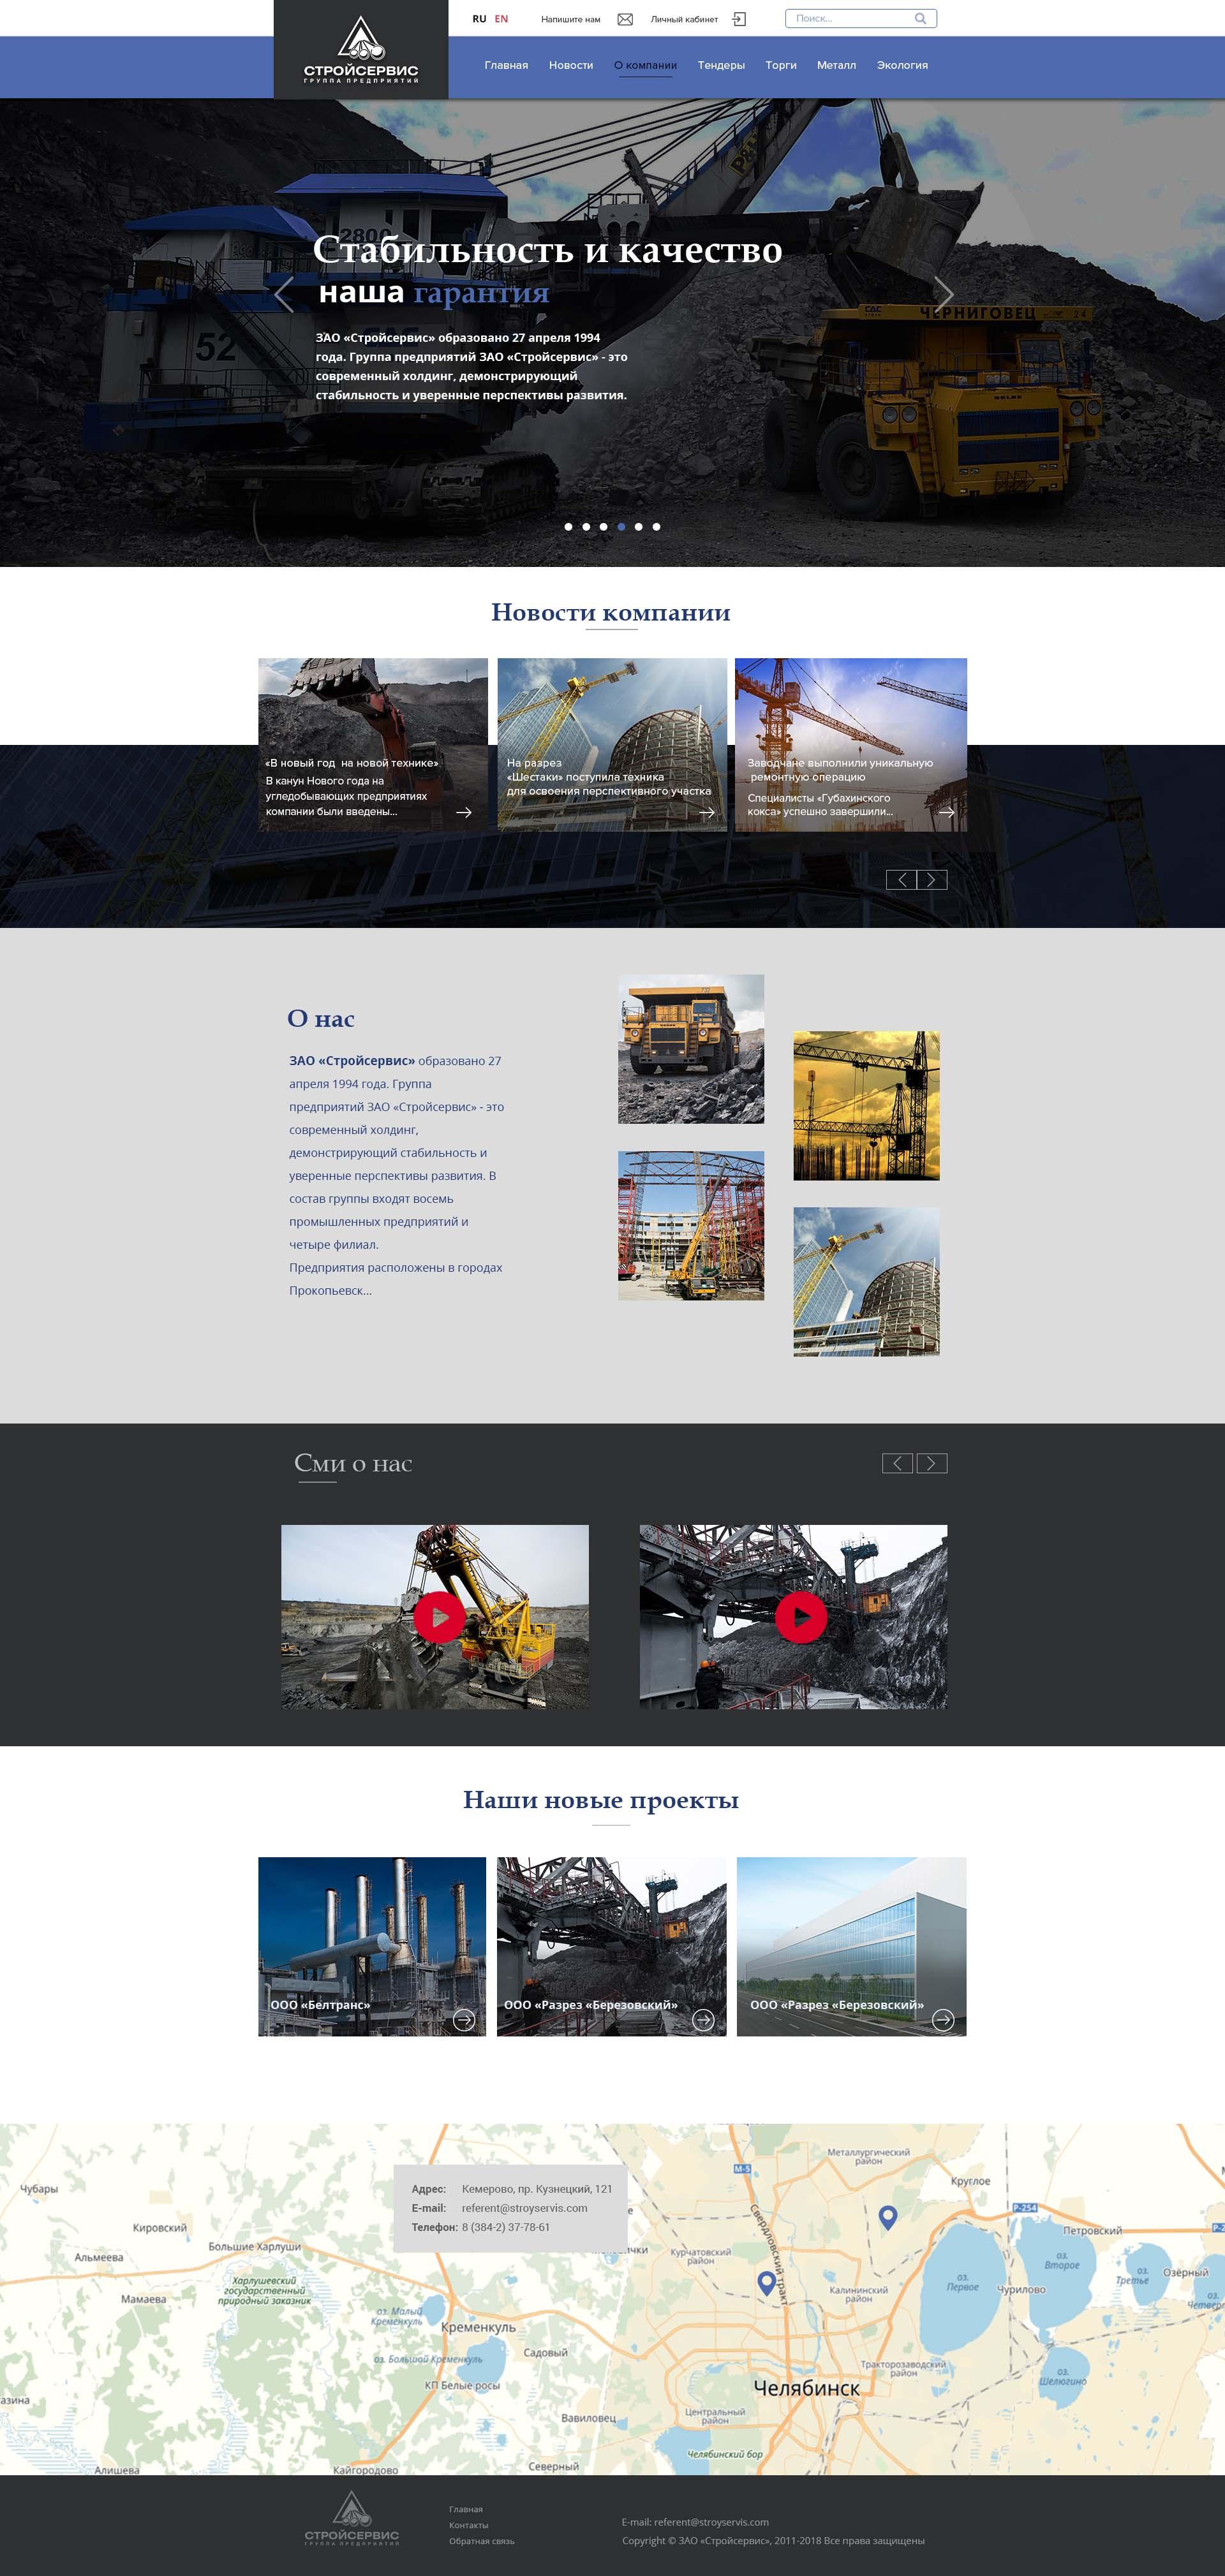 Разработка дизайна сайта угледобывающей компании фото f_6865a707b0e4210d.jpg